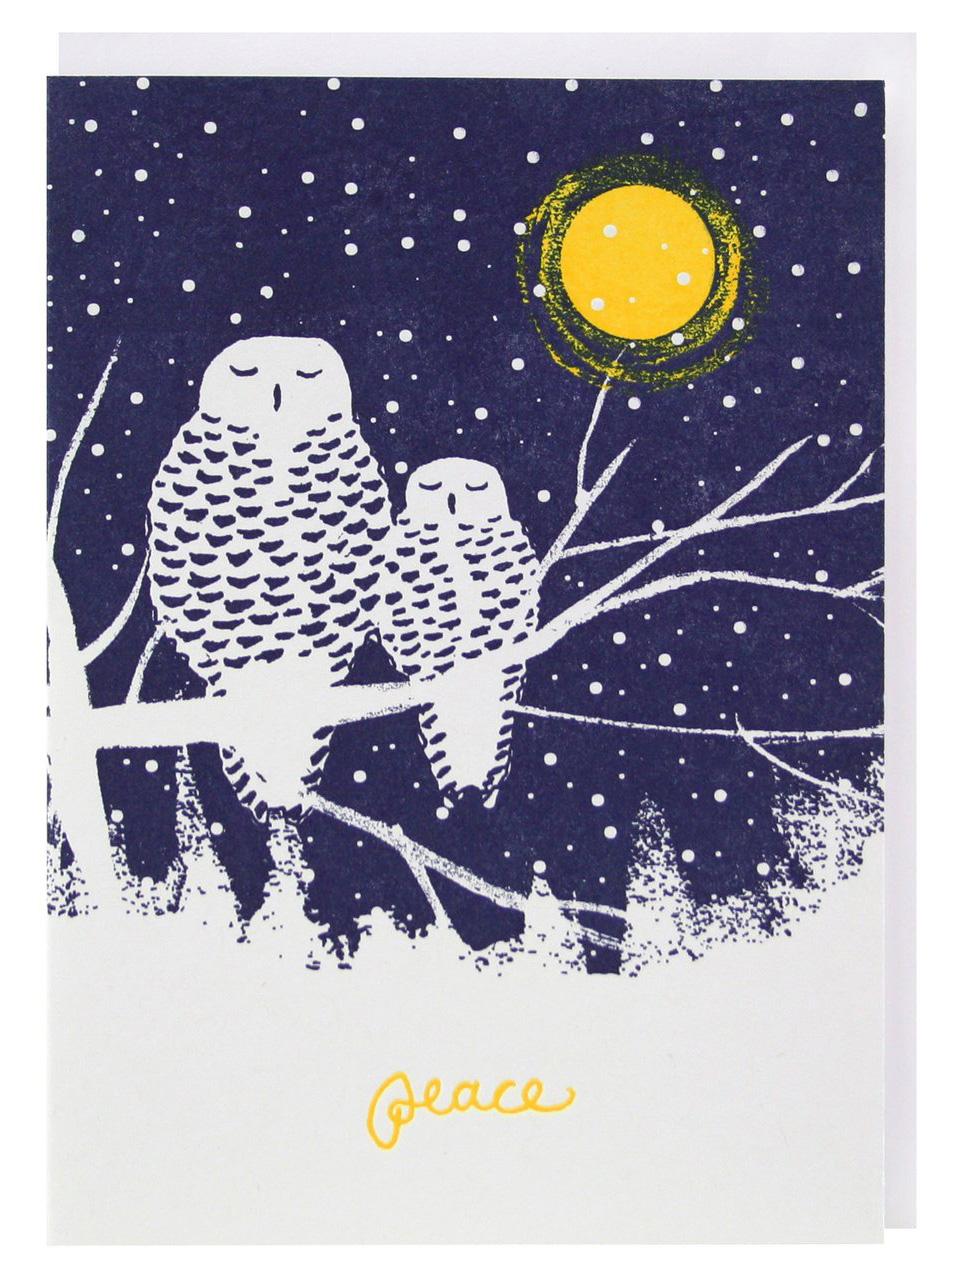 Peaceful-Owls-Holiday-Card_1280x1280.jpg